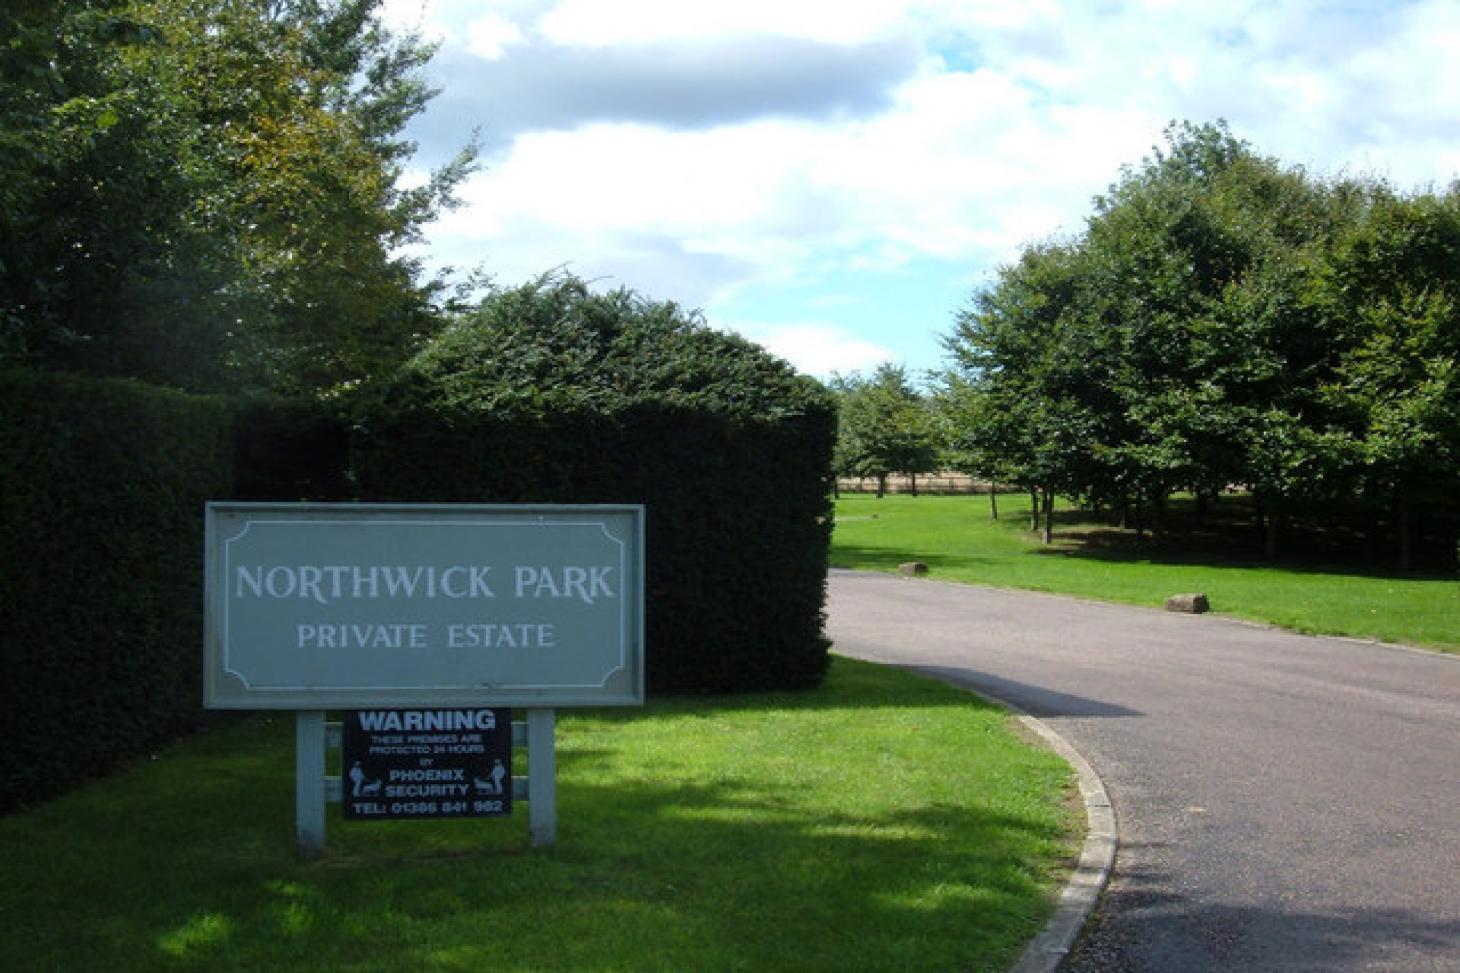 Northwick Park 5 a side | Grass football pitch